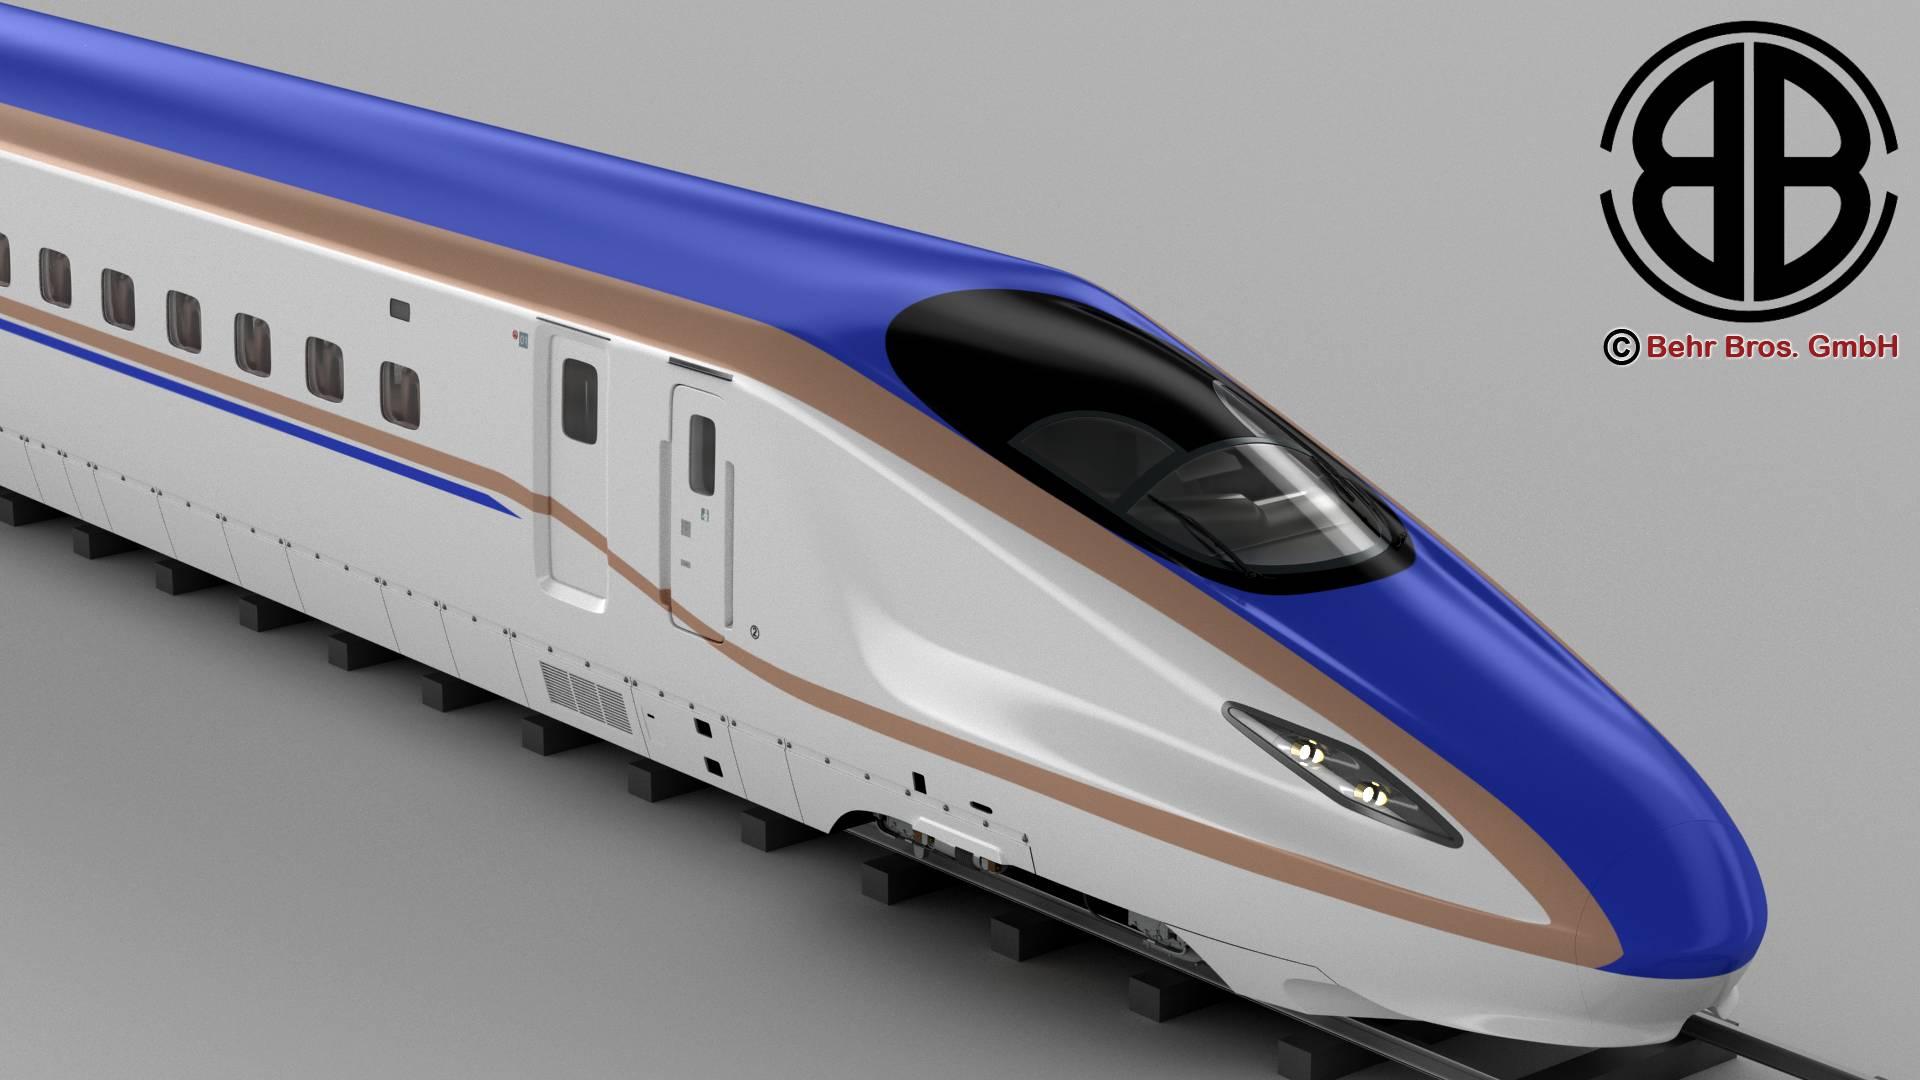 shinkansen e7 3d model 3ds max fbx c4d